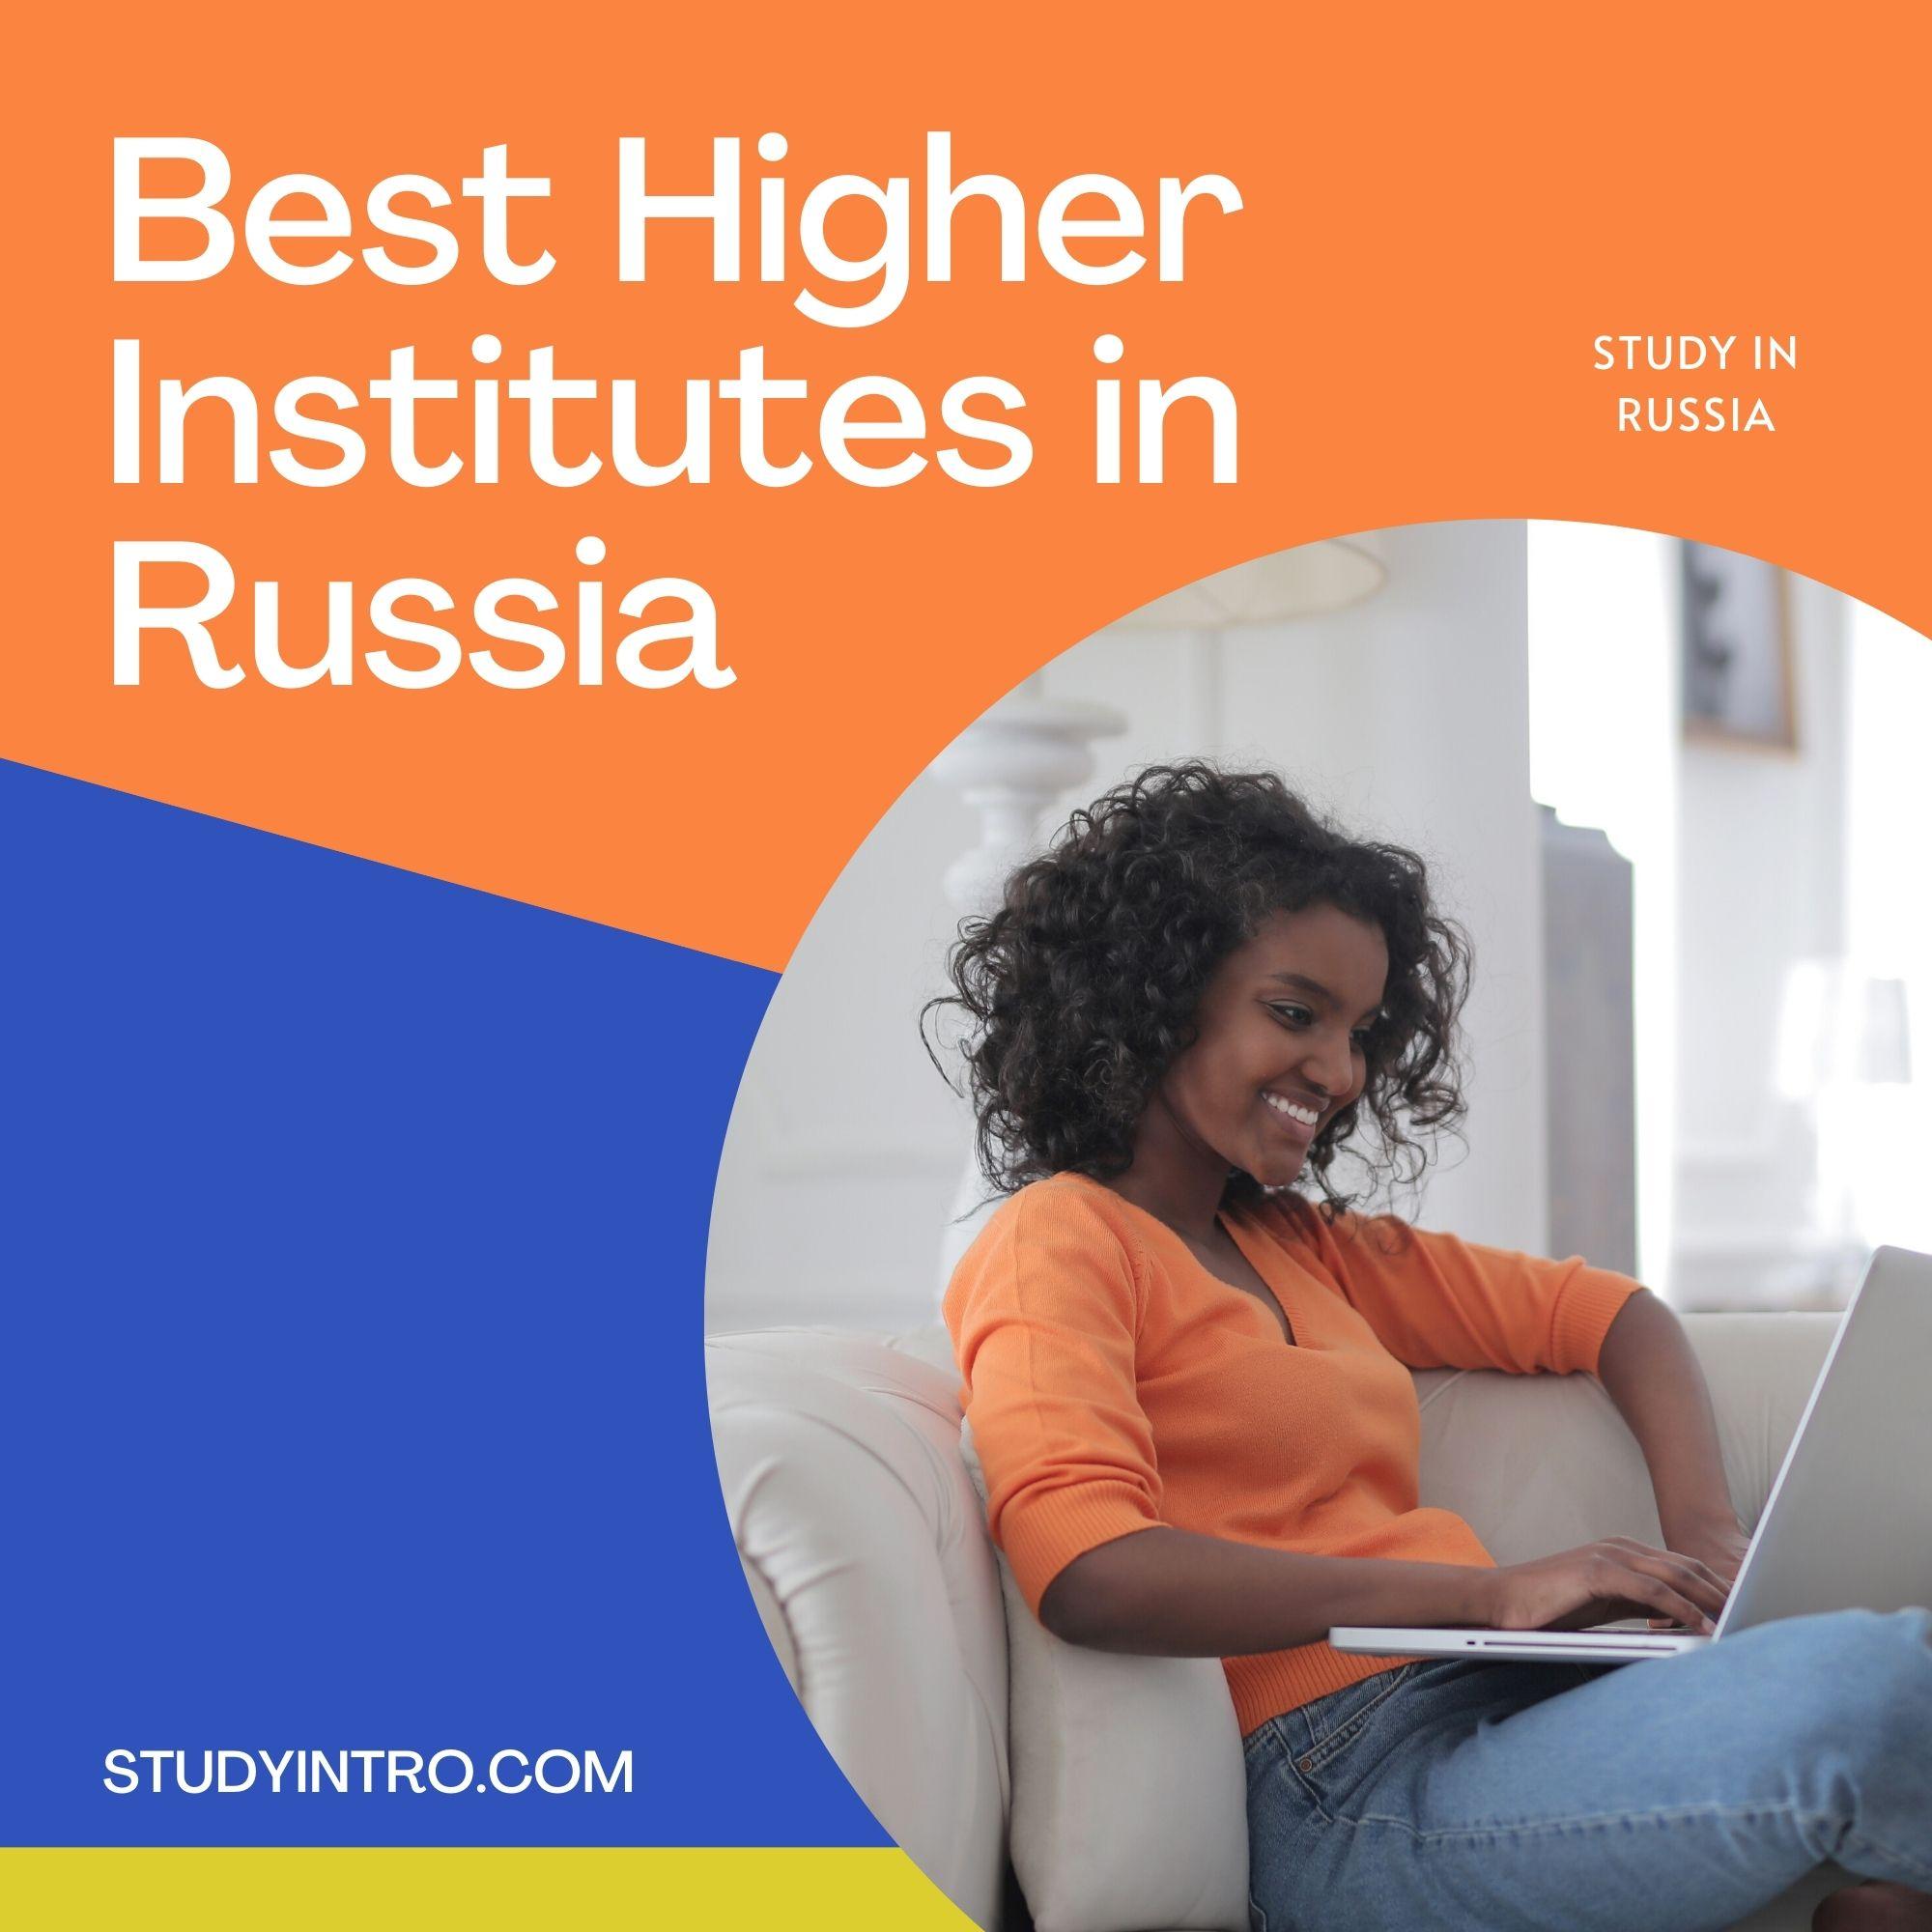 Best Higher Institutes in Russia